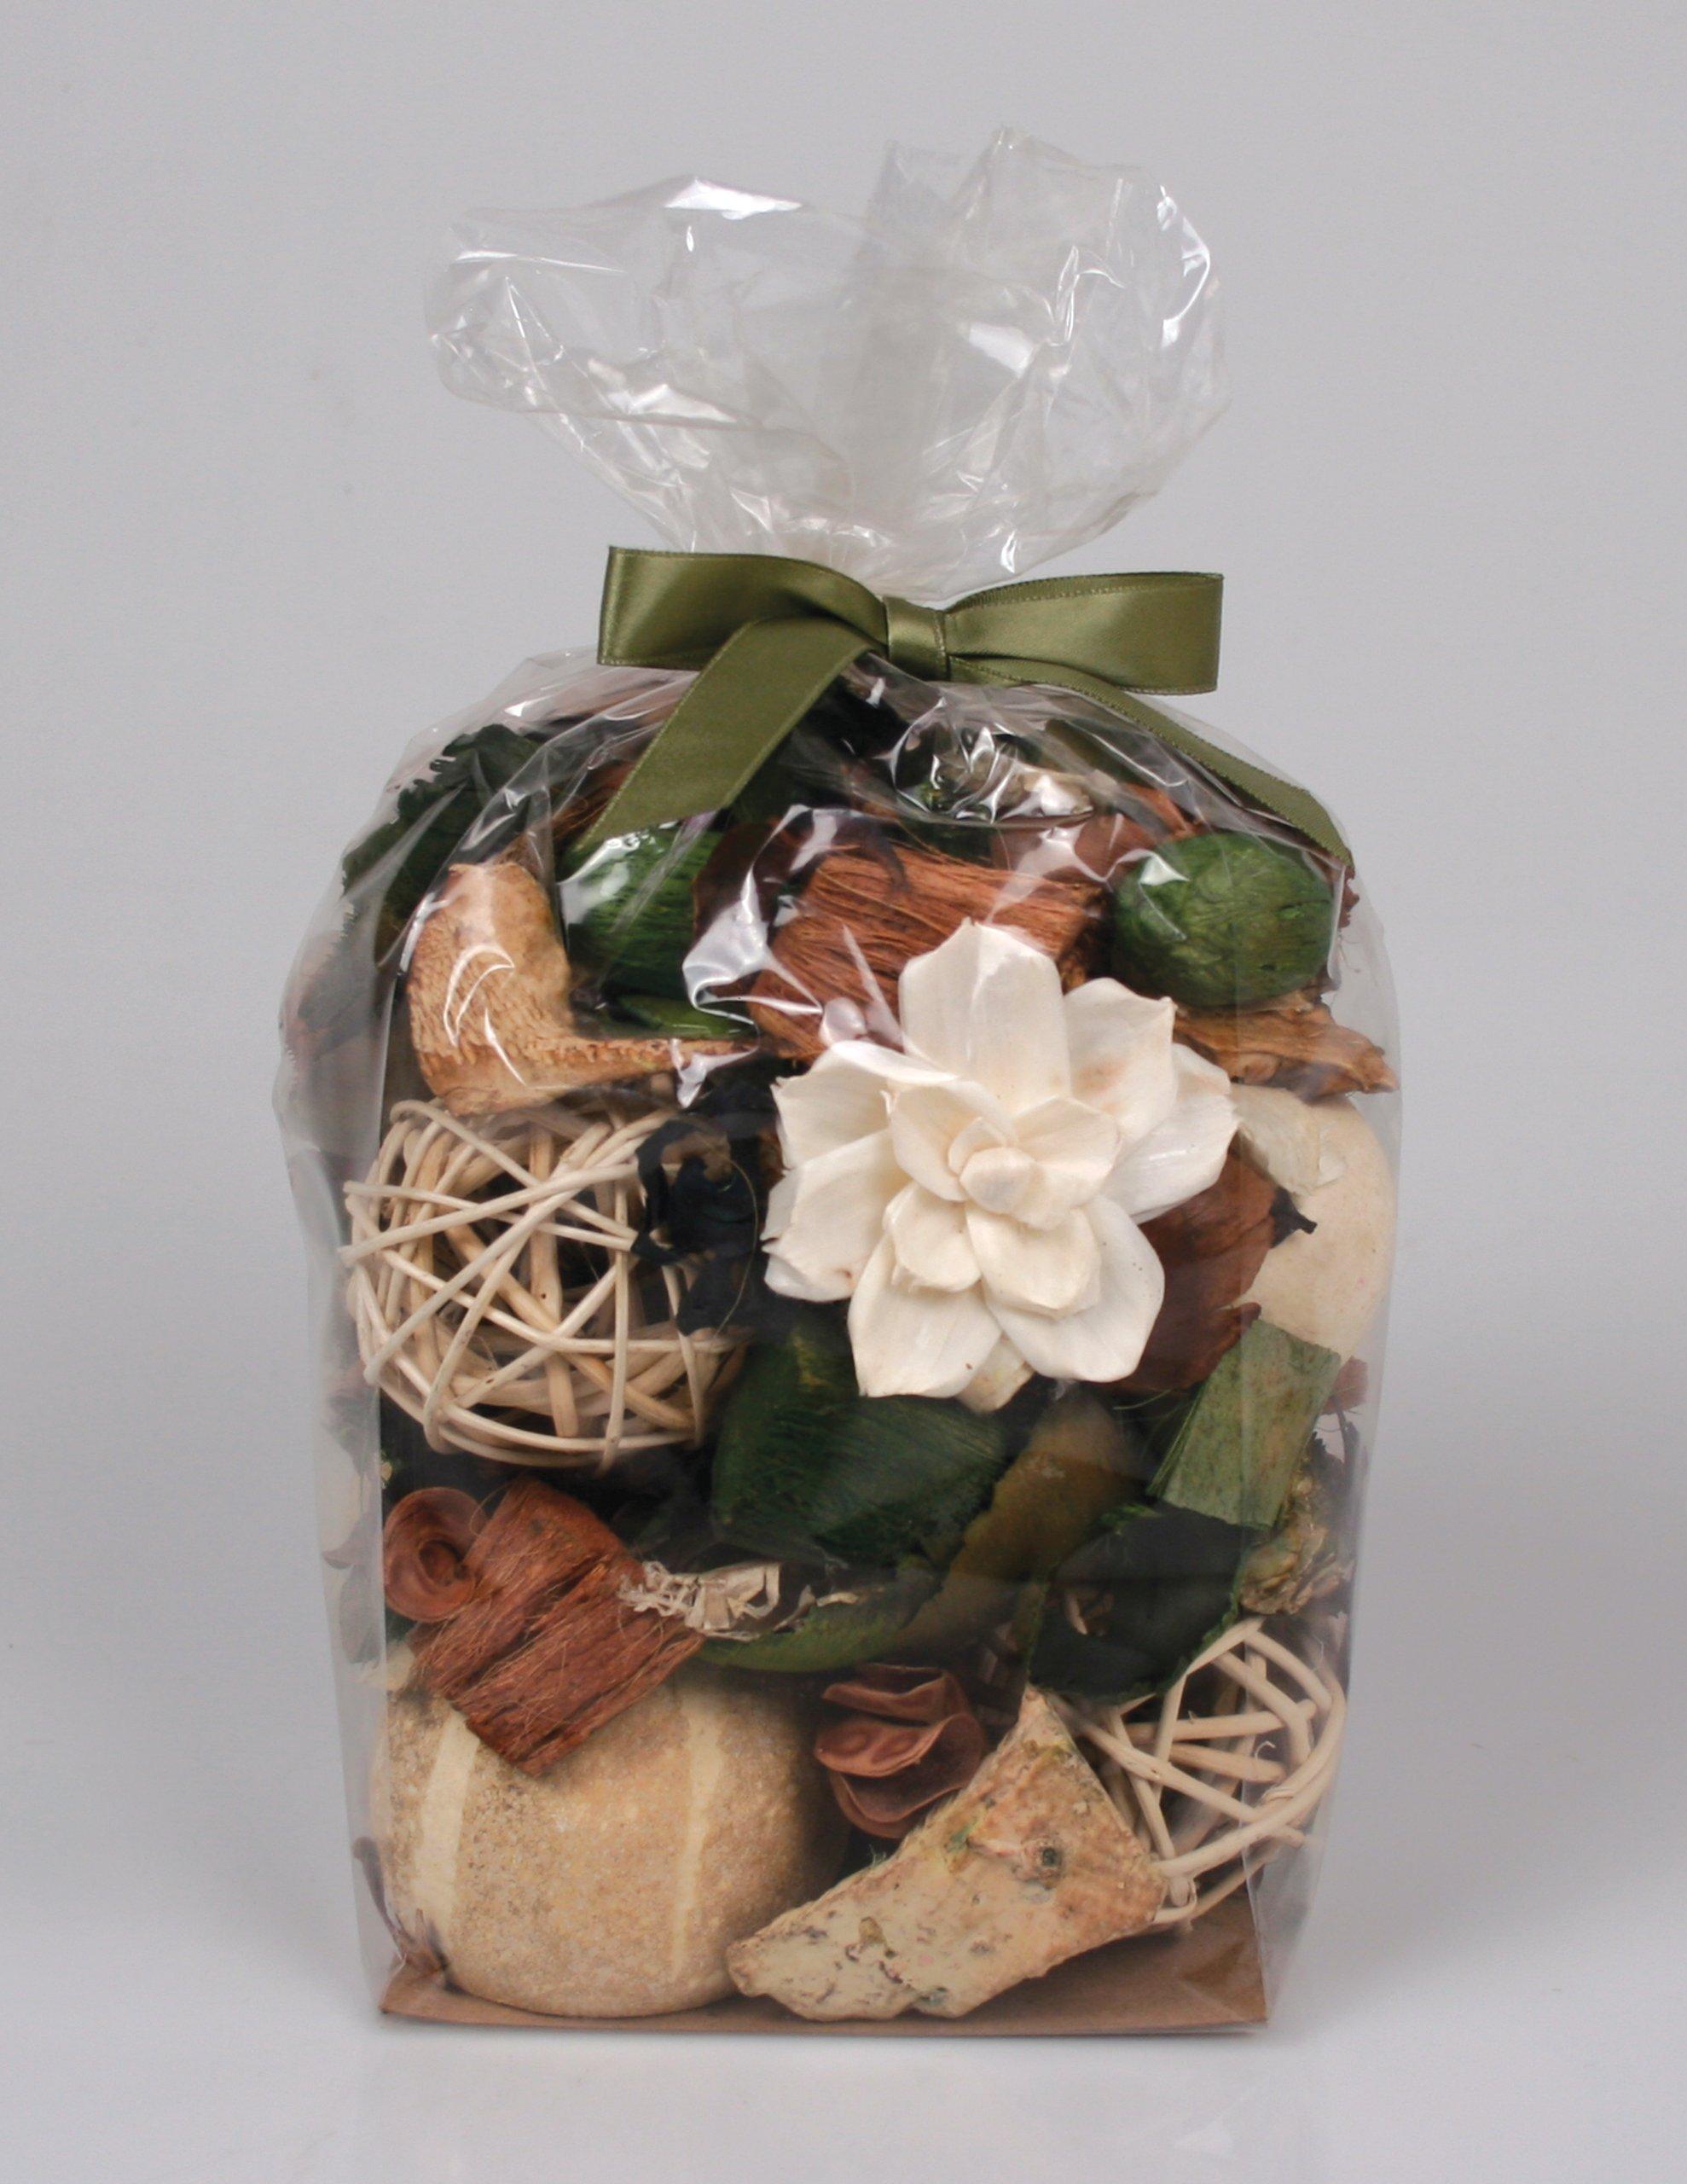 Jodhpuri Natural Gardenia Scented Potpourri – Fragrance Botanical Mix for Your Bathroom, Living Room, & Office – Includes Tahitian Gardenia, Jasmine, Tuberose, Green Leaves - 12 Oz